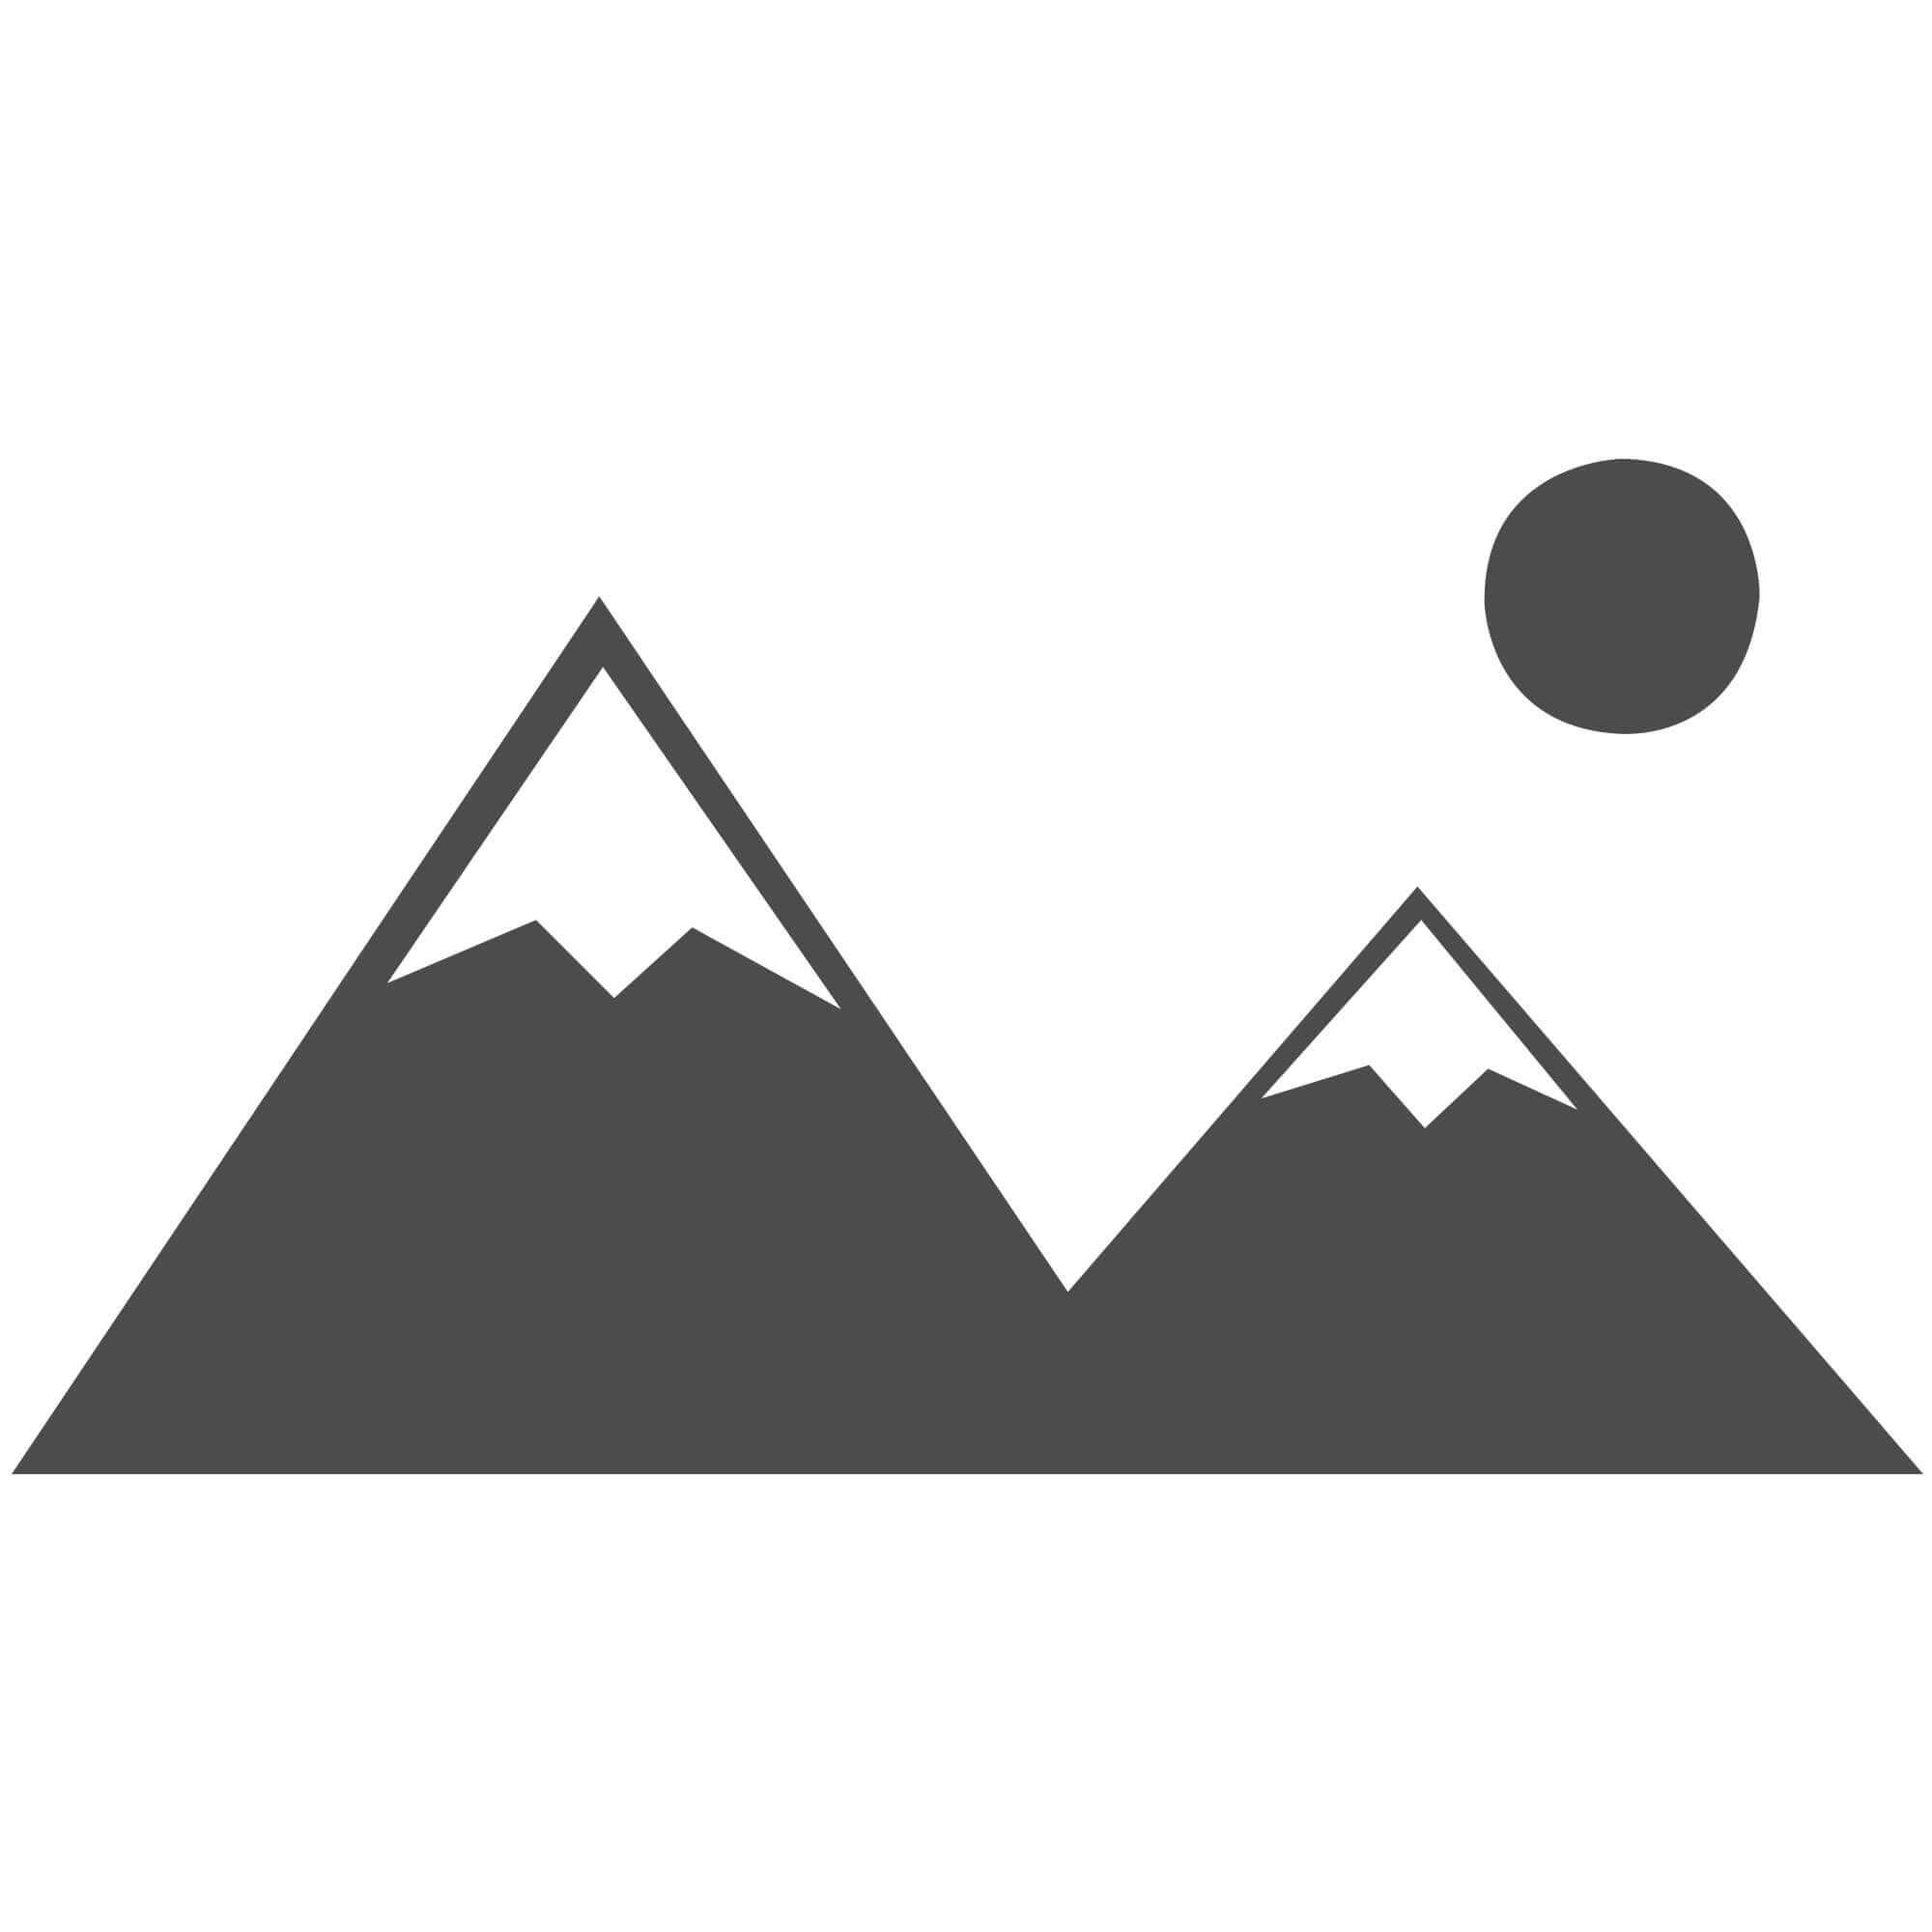 "Arabesque Moroccan Pattern Wool Rug - Grey-80 x 150 cm (2'8"" x 5')"